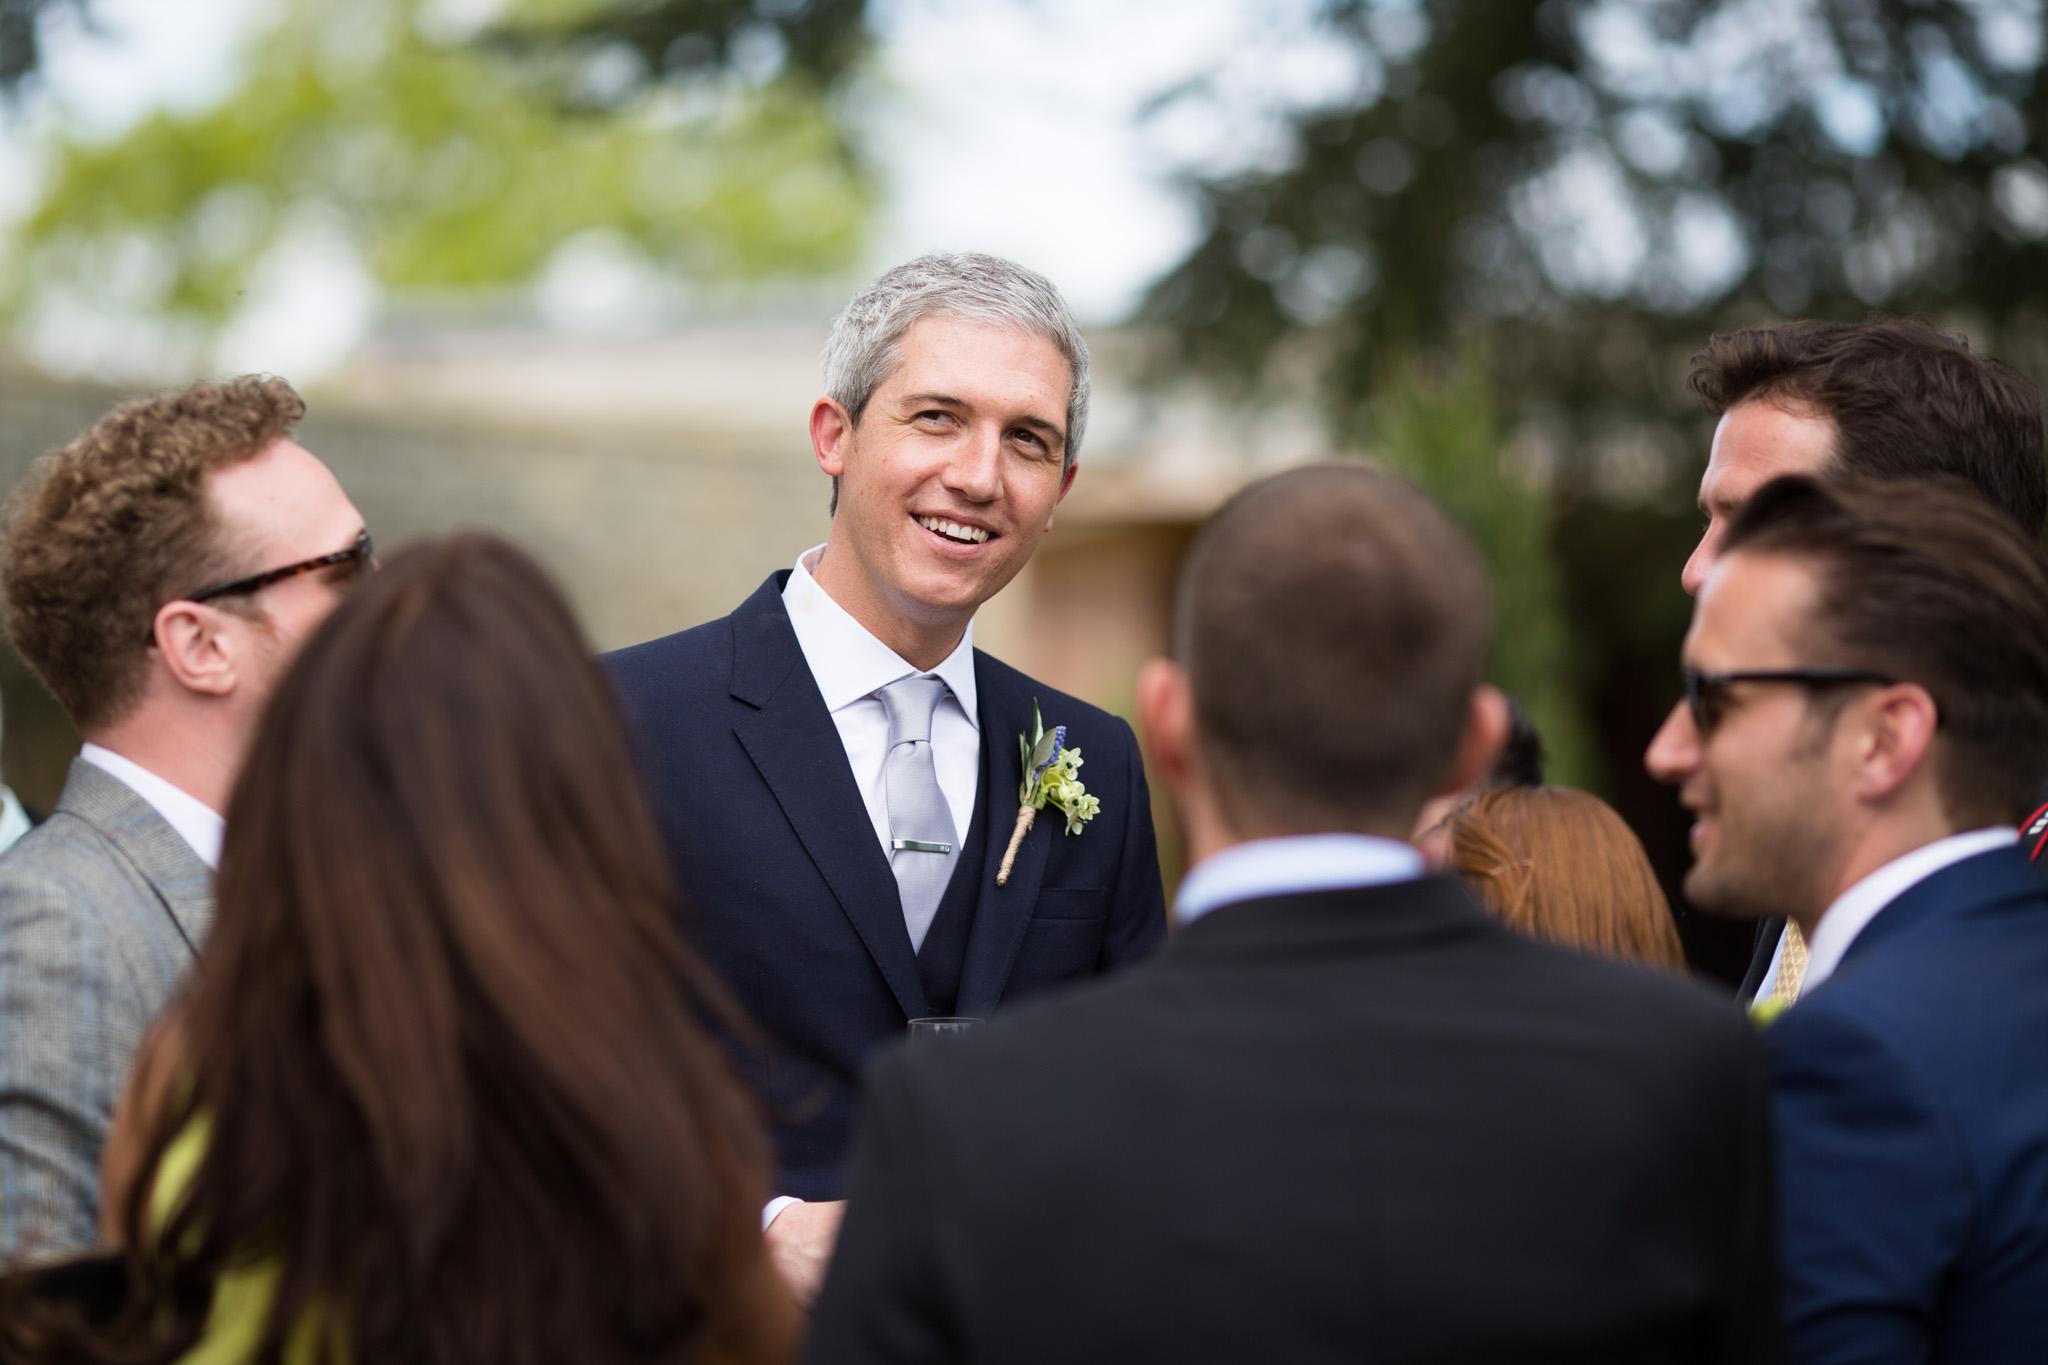 Mark_Barnes_Gloucester_Wedding_Photographer_Elmore_Court_Wedding_Photography_Mike+Kelly-60.jpg